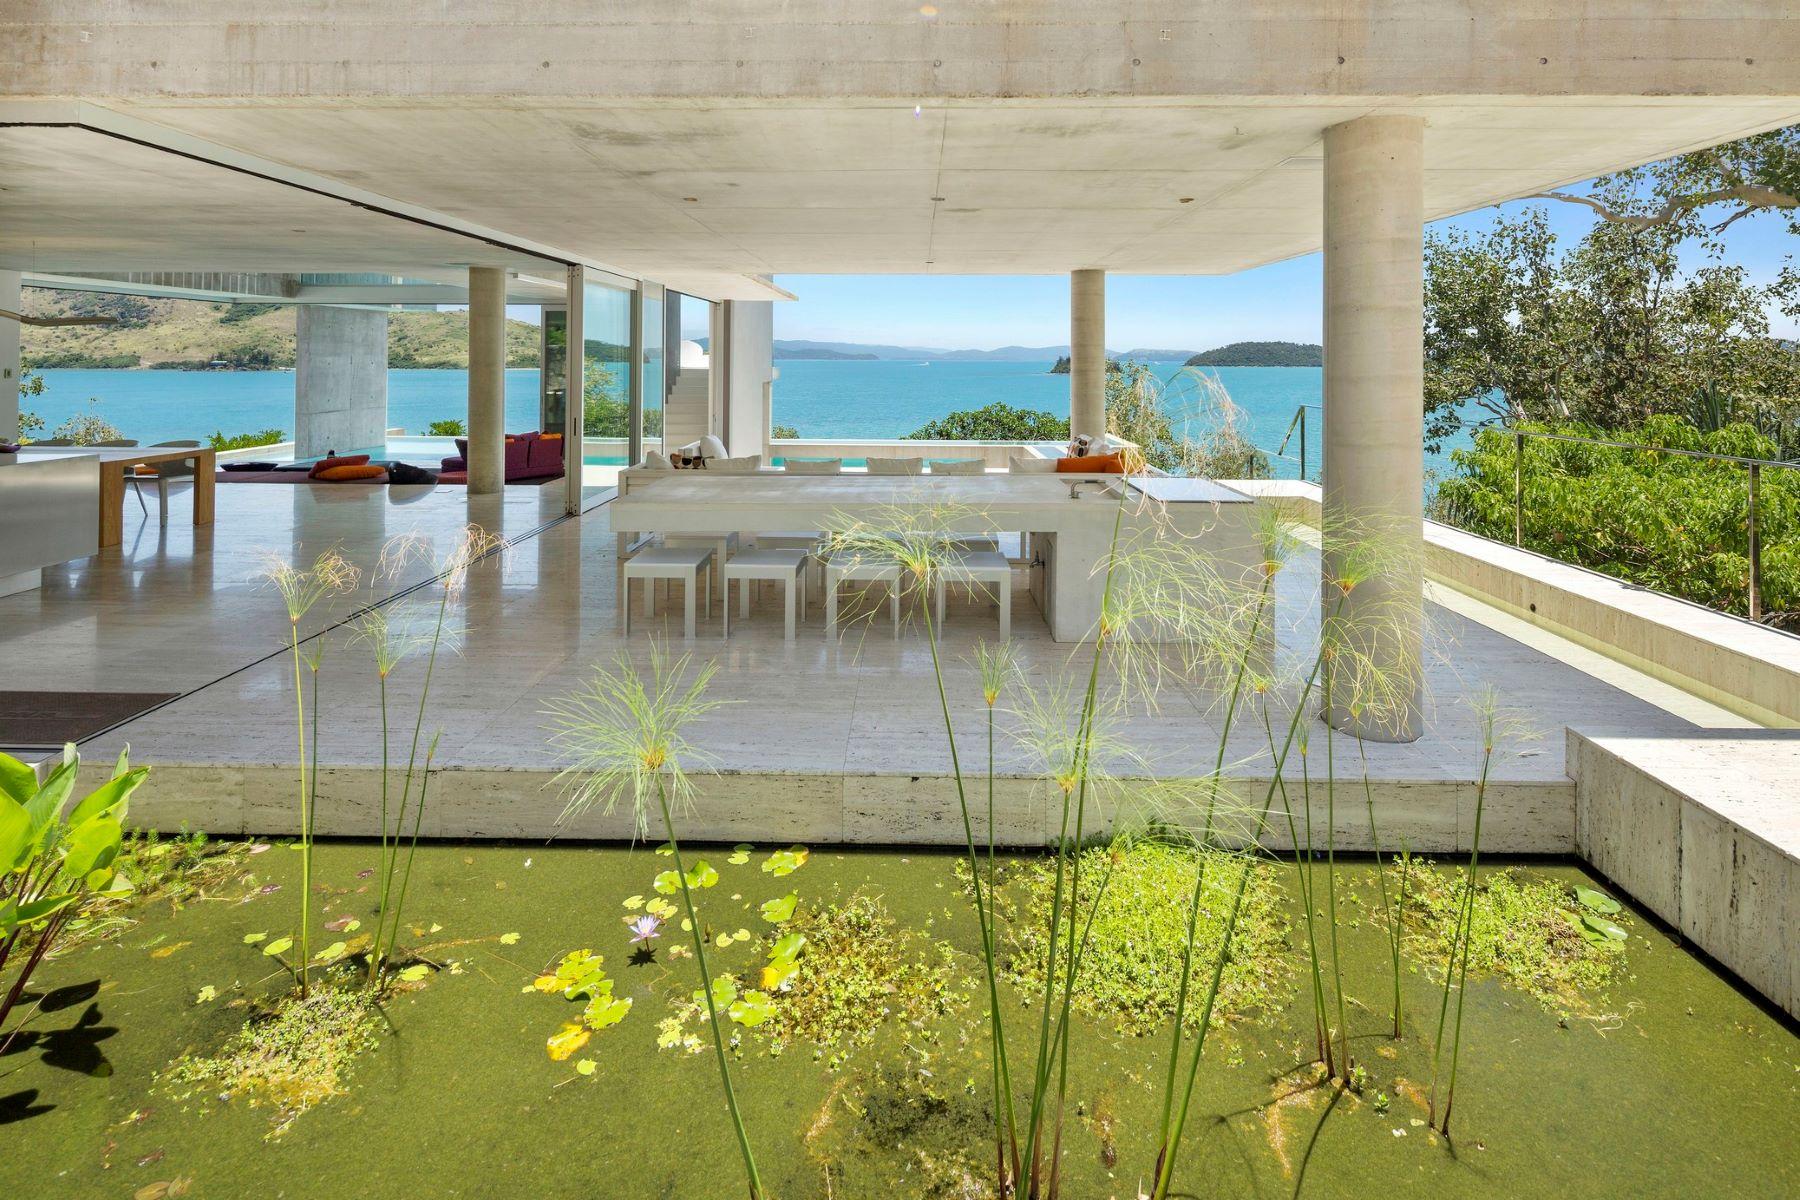 獨棟家庭住宅 為 出售 在 Solis 4 Plum Pudding Close Whitsundays, Queensland, 4803 澳大利亞